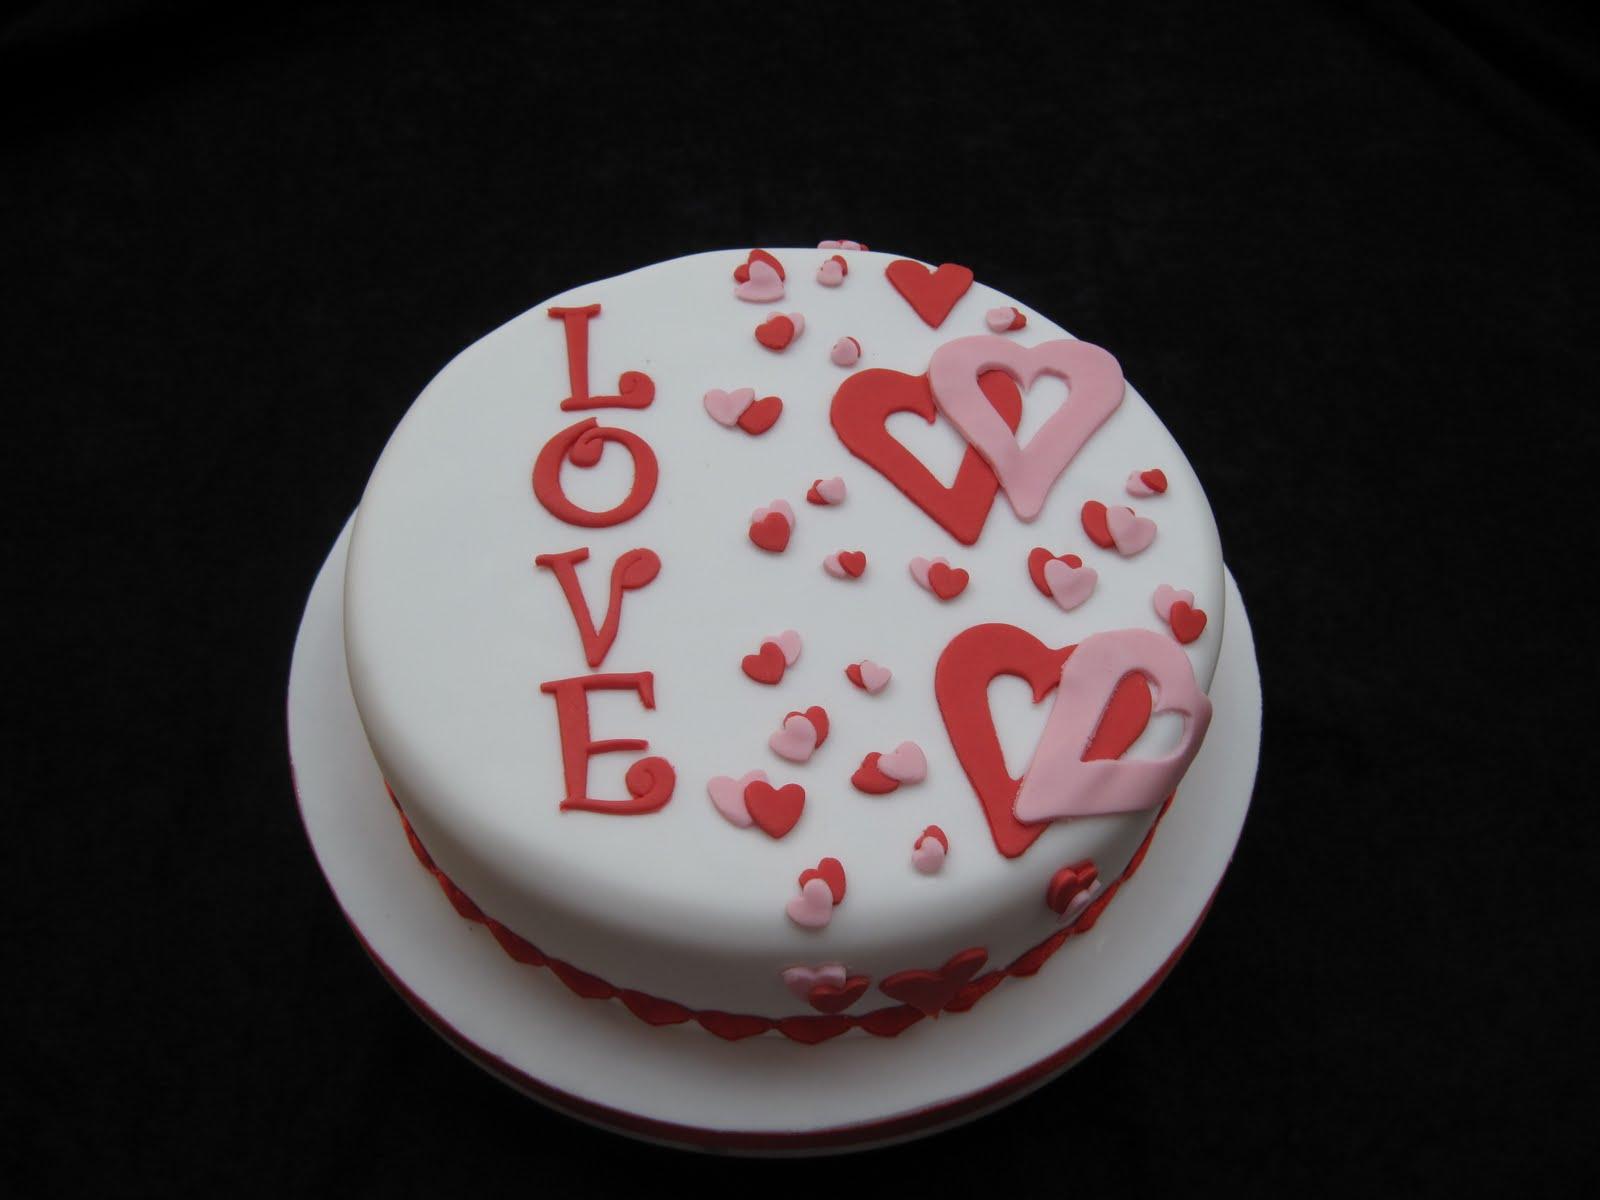 pretty valentine's day cake design | dmards